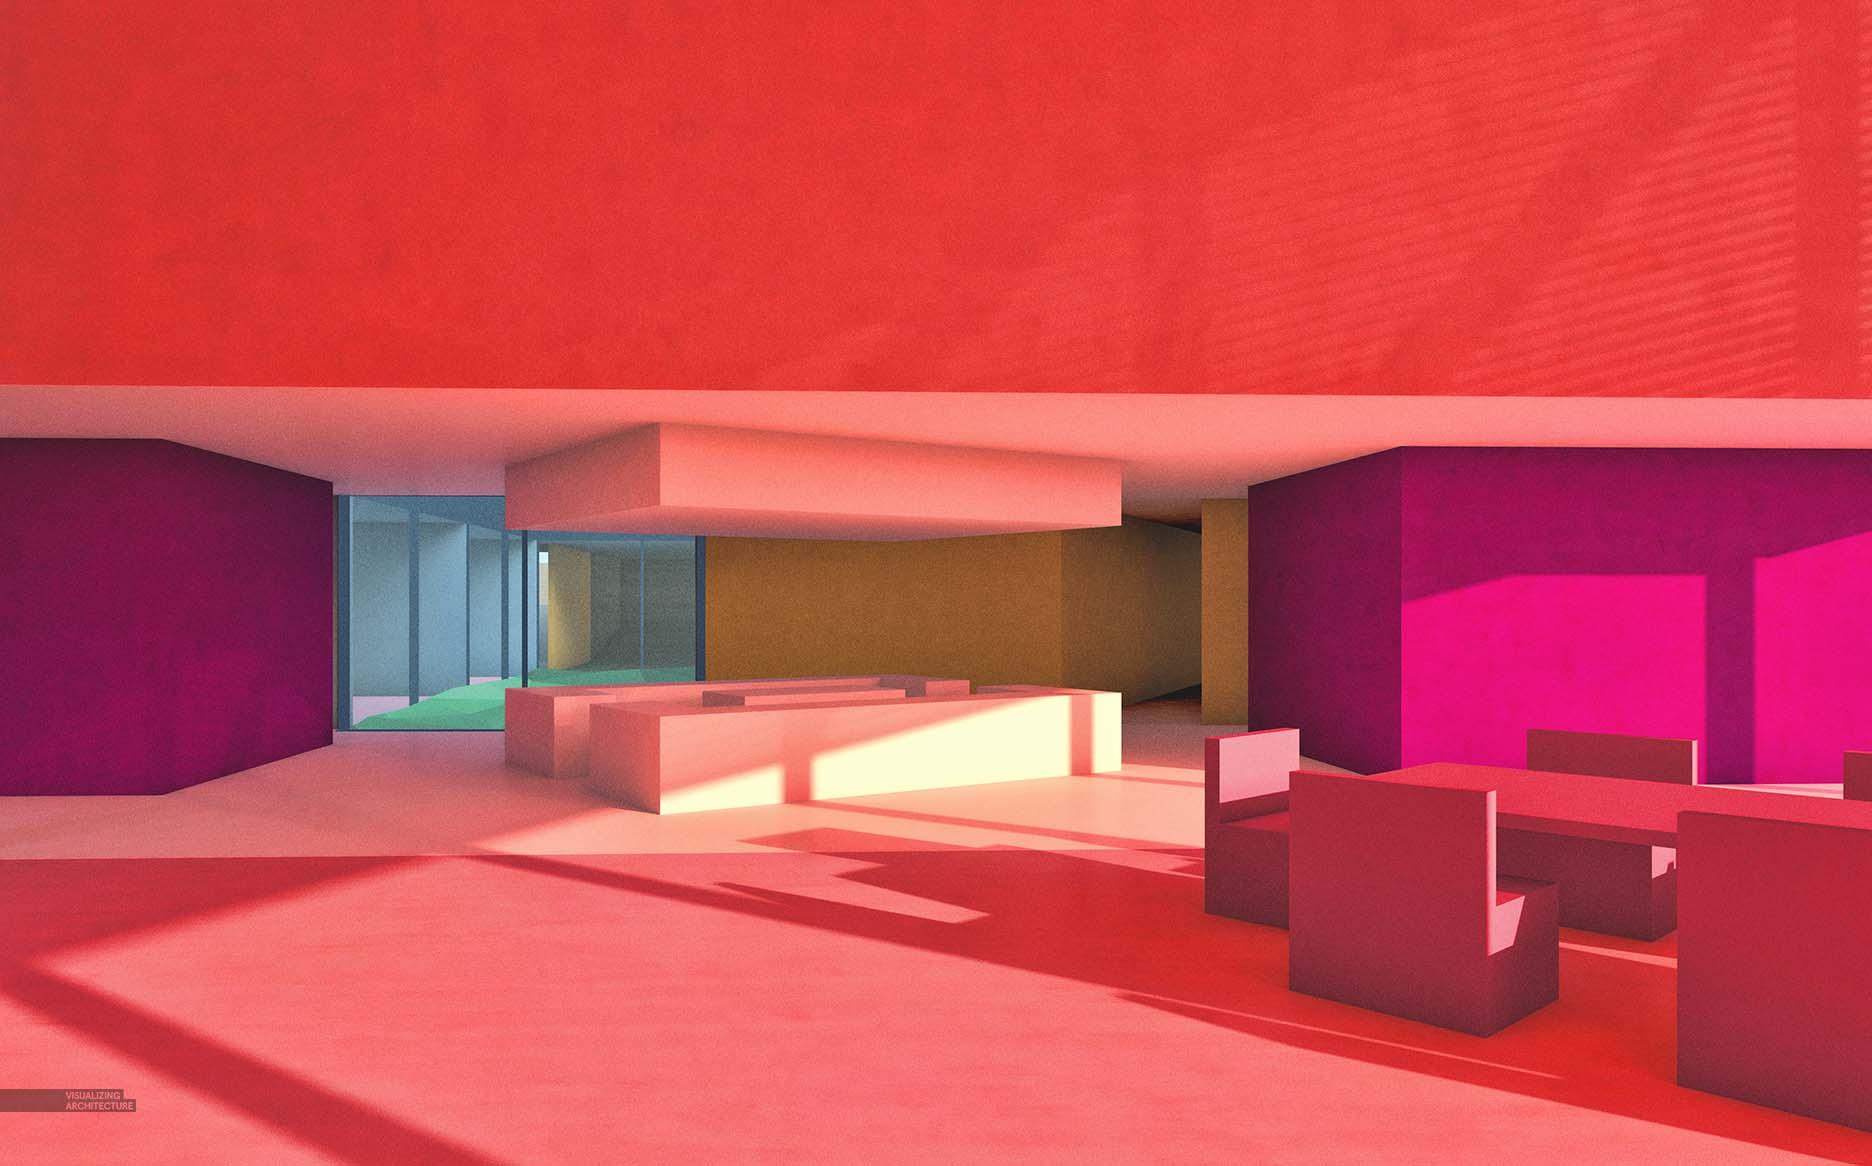 All tutorials visualizing architecture for Schematic design interior layout vignette